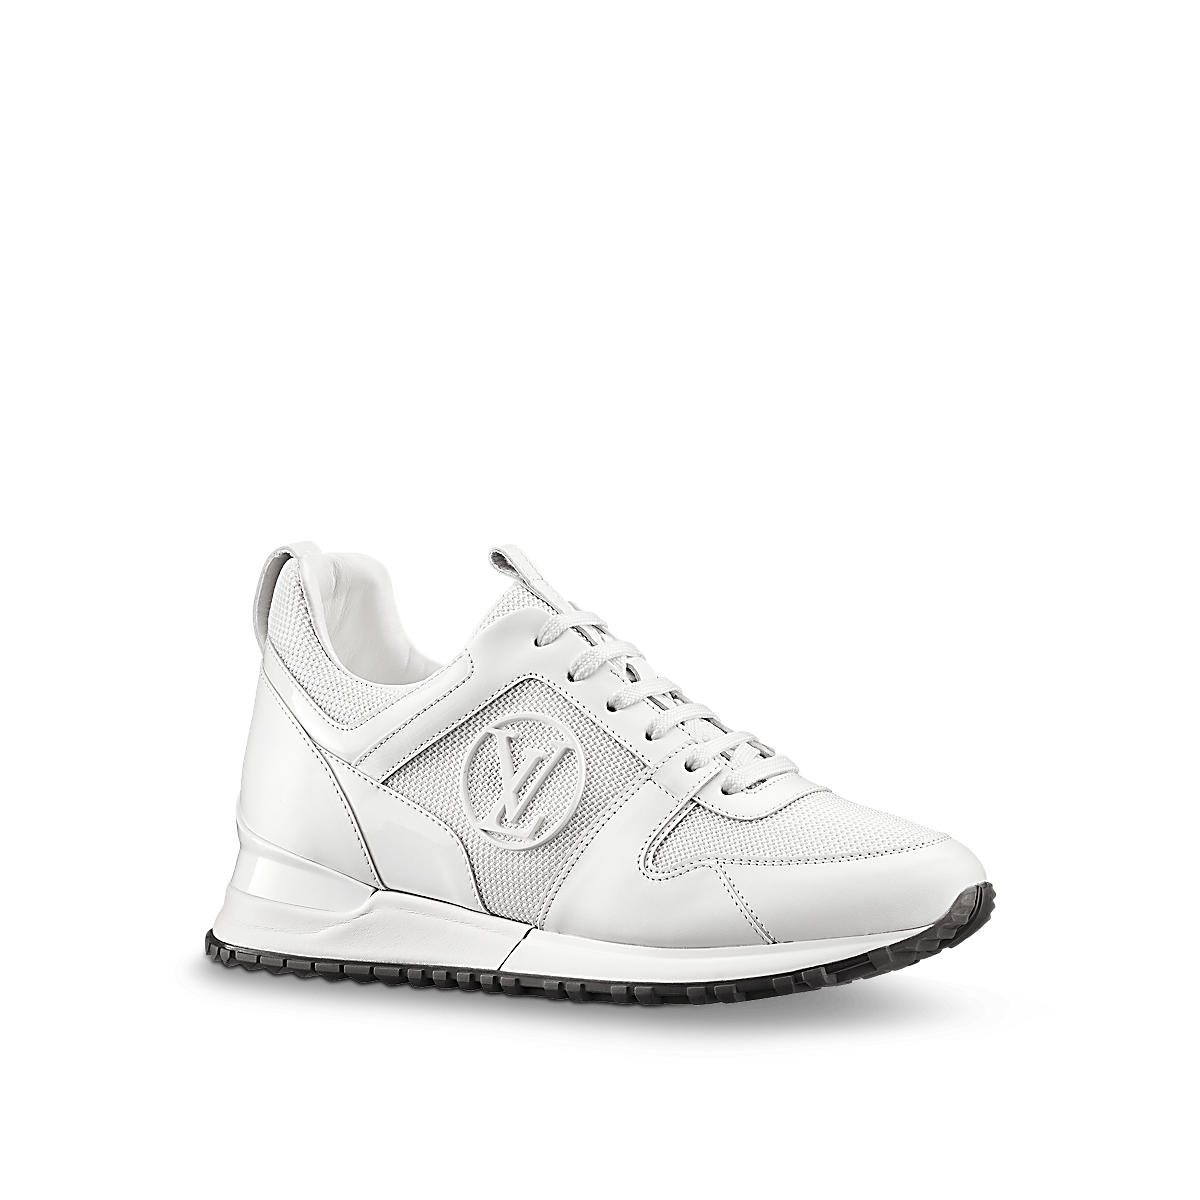 e04cdd80d663 Louis Vuitton Runaway White Sneakers